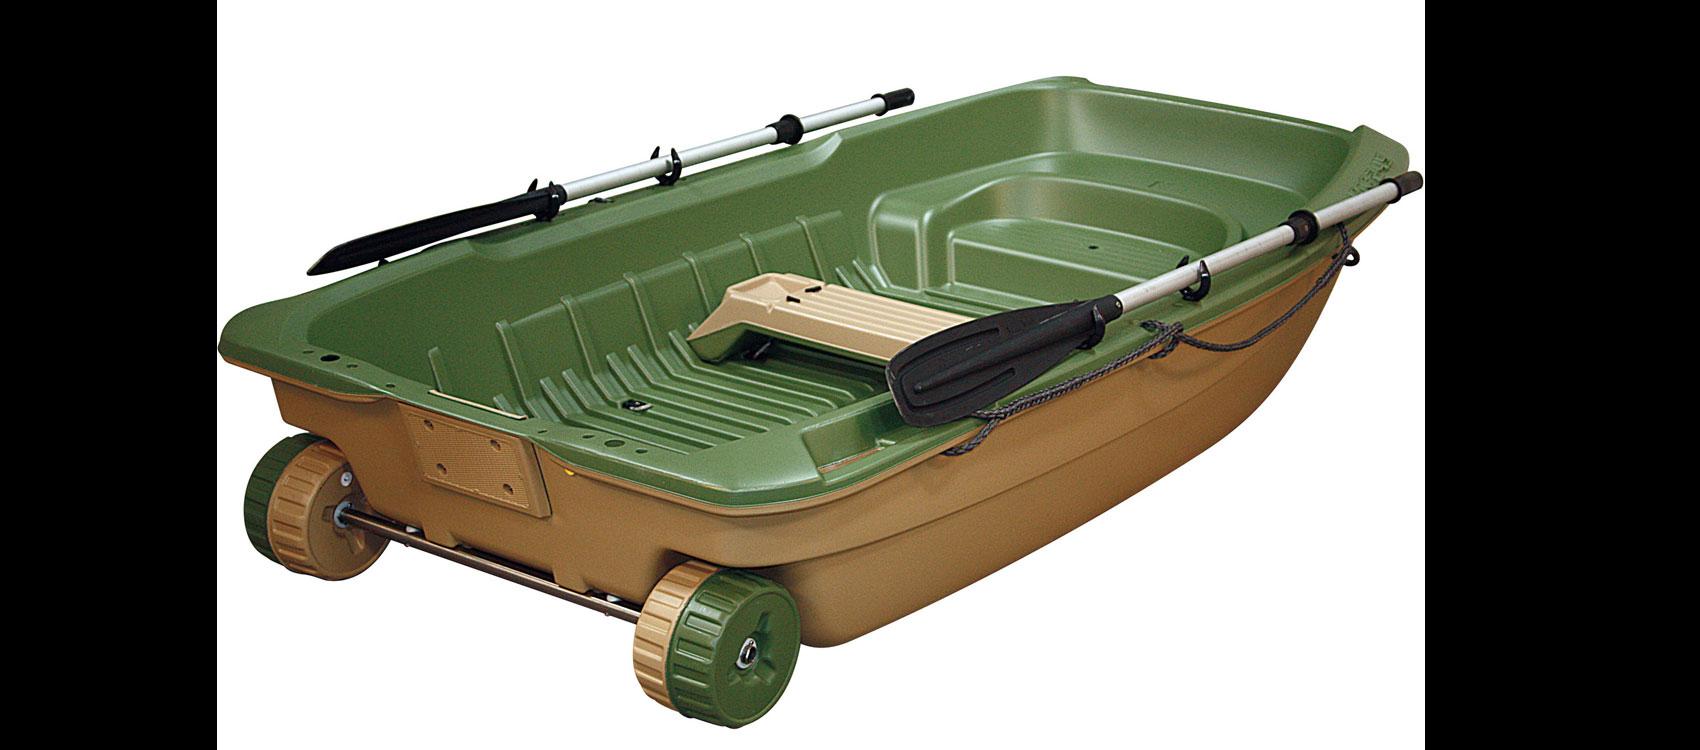 Bic 245 Boat - Green